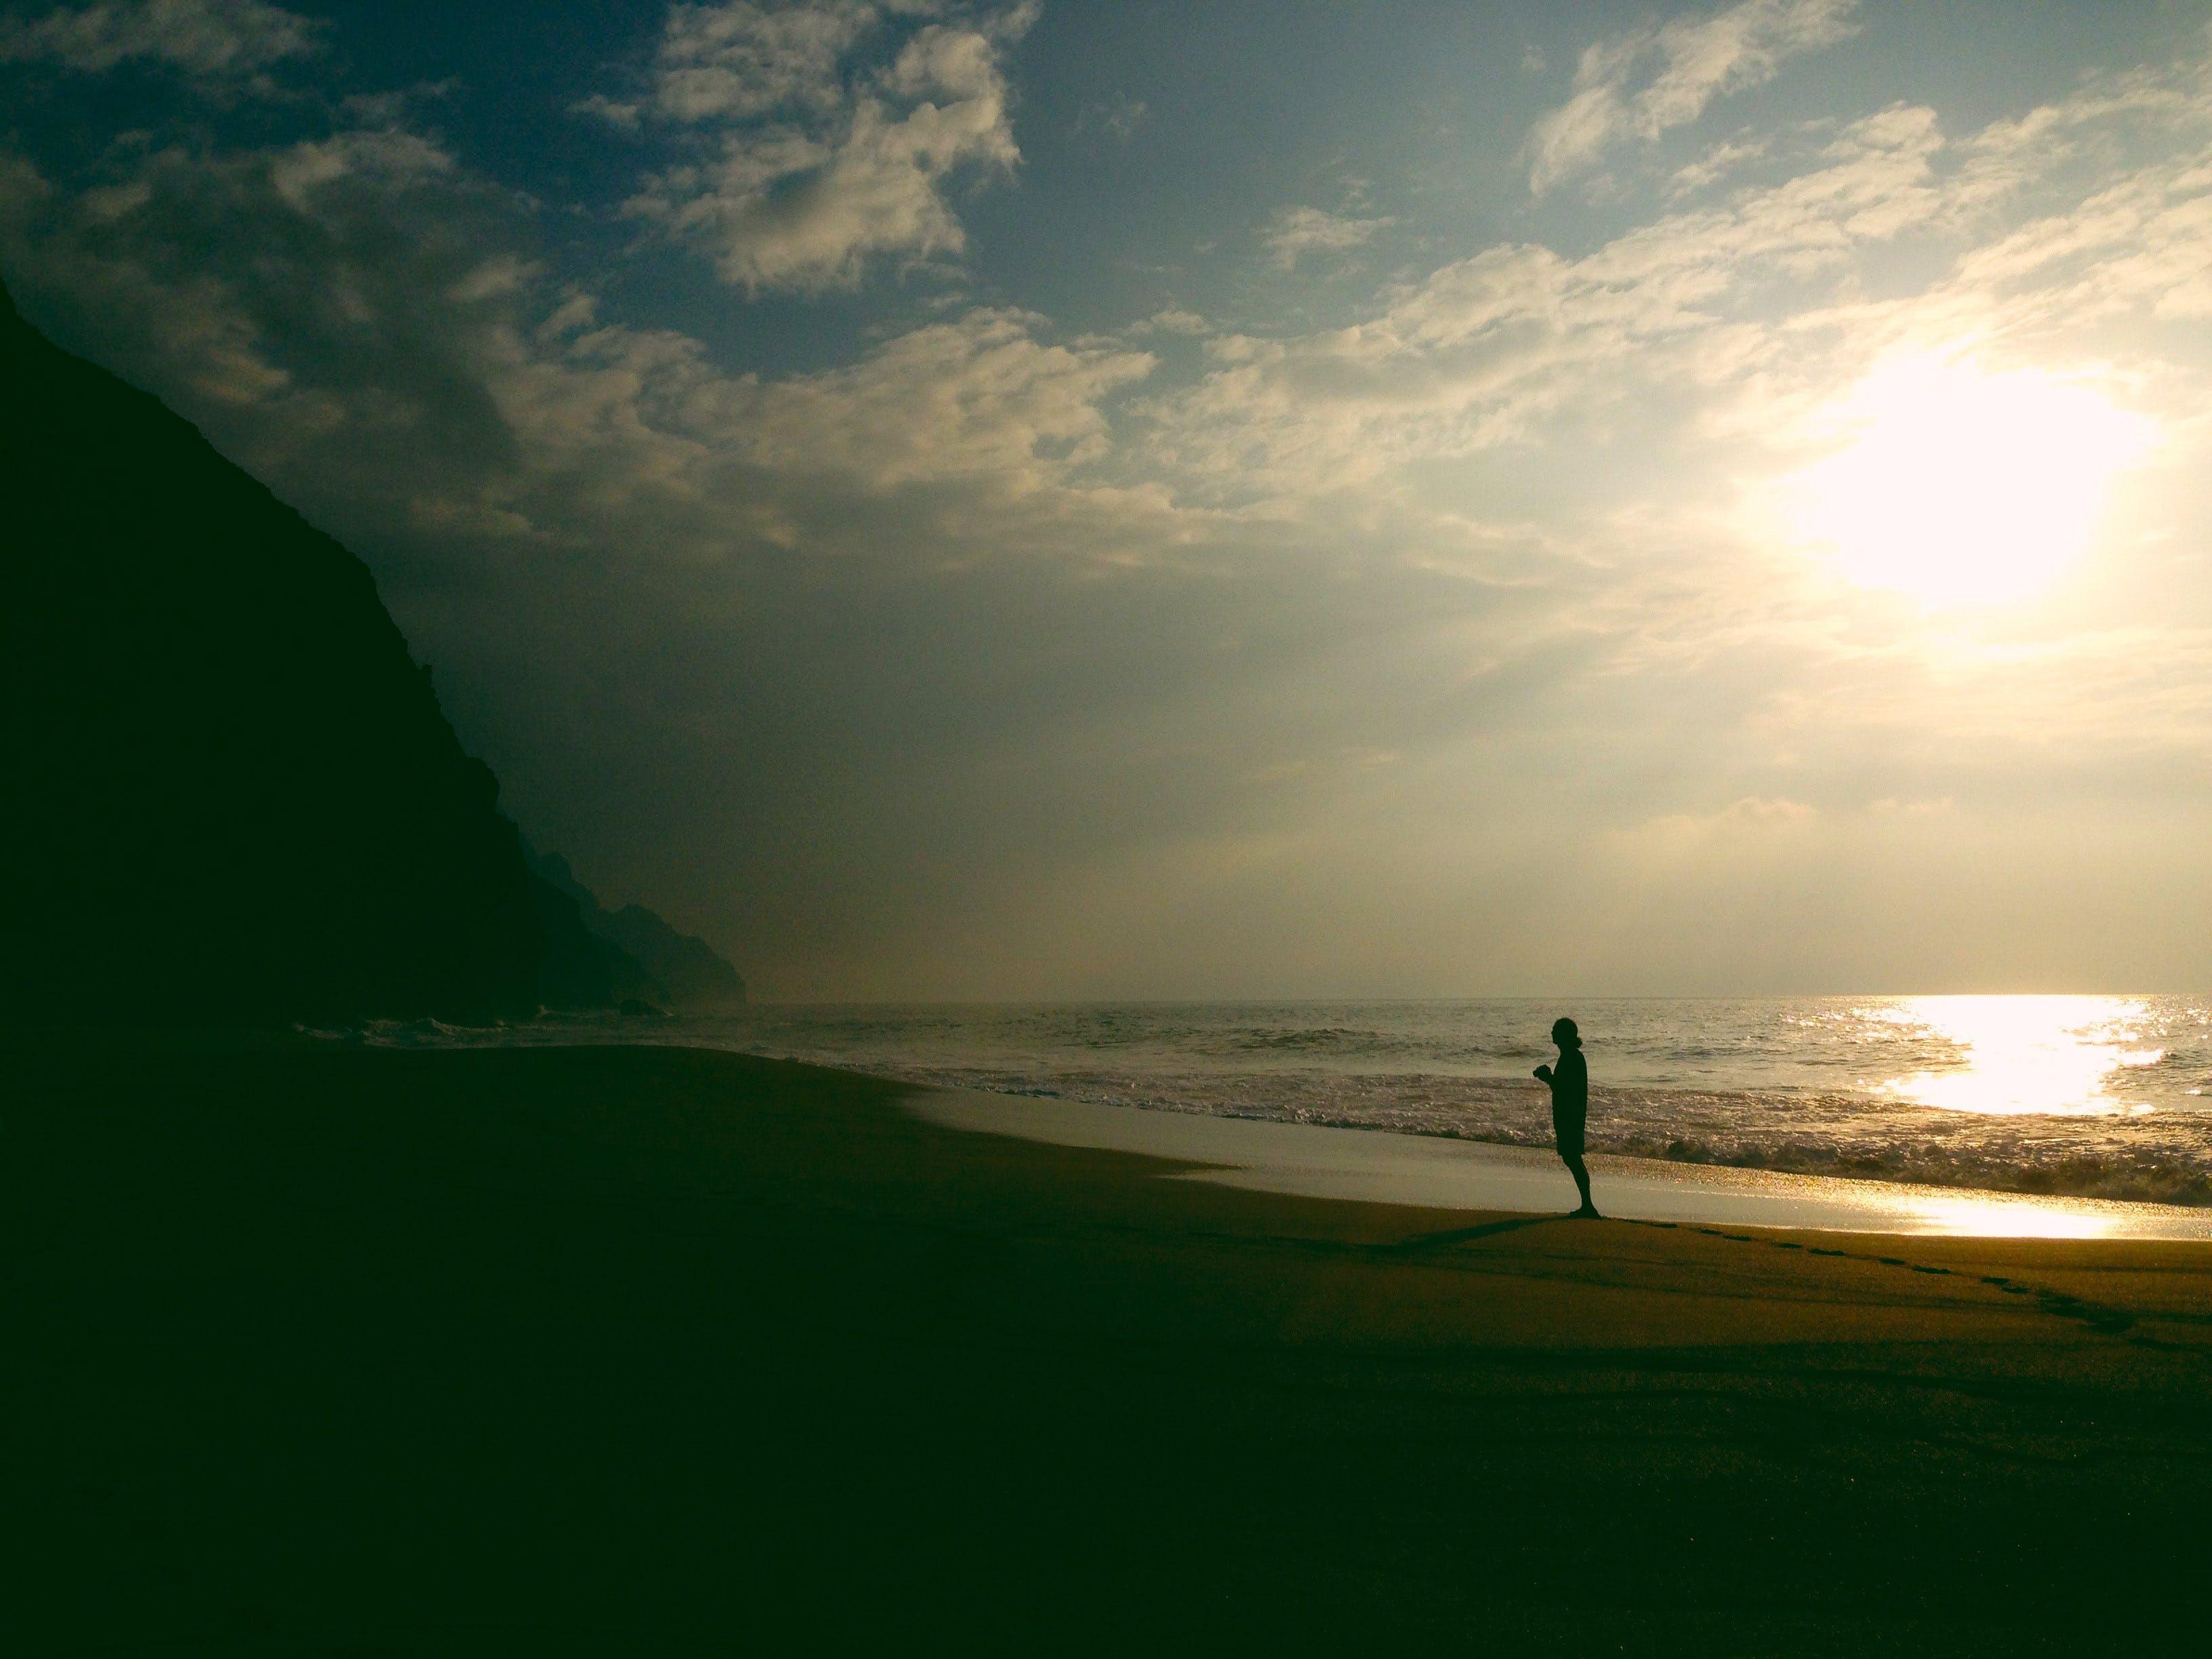 Free stock photo of sea, person, beach, sunshine